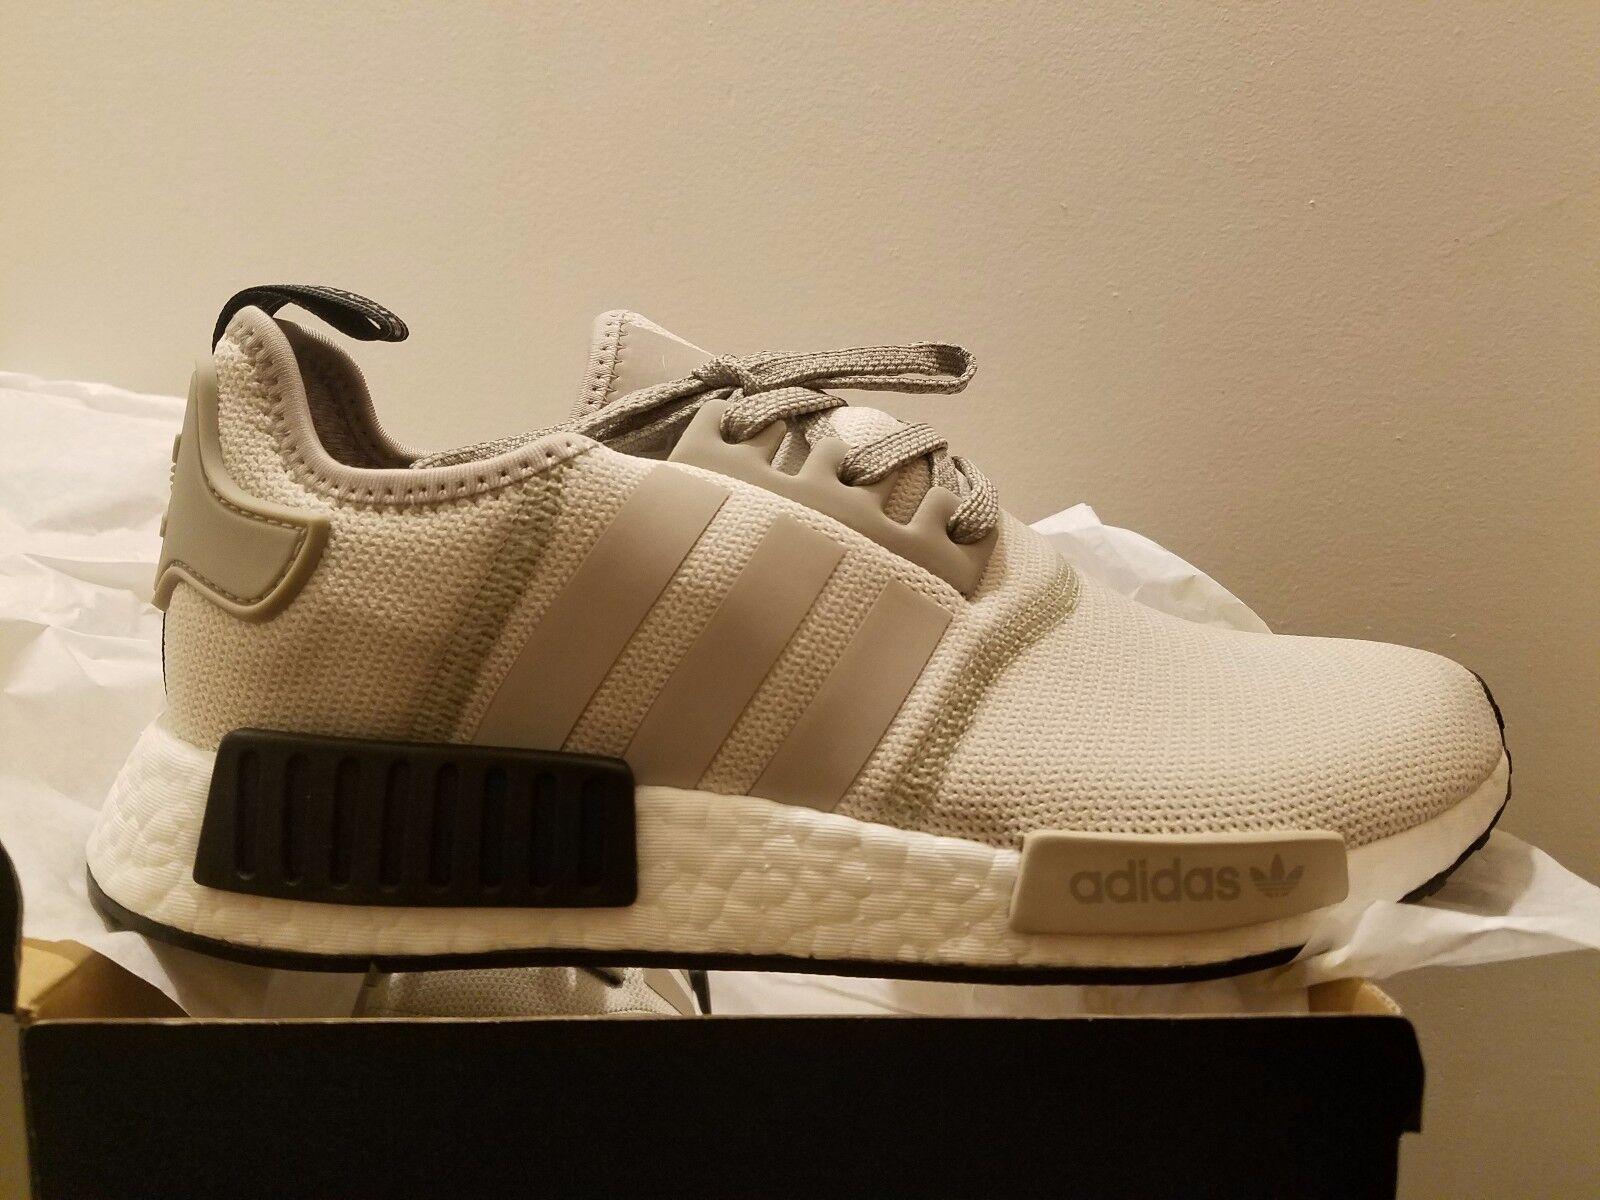 Adidas NMD R1 Runner Tan White Cream Black Black Black Khaki Mens shoes S76848 All size e86e9b